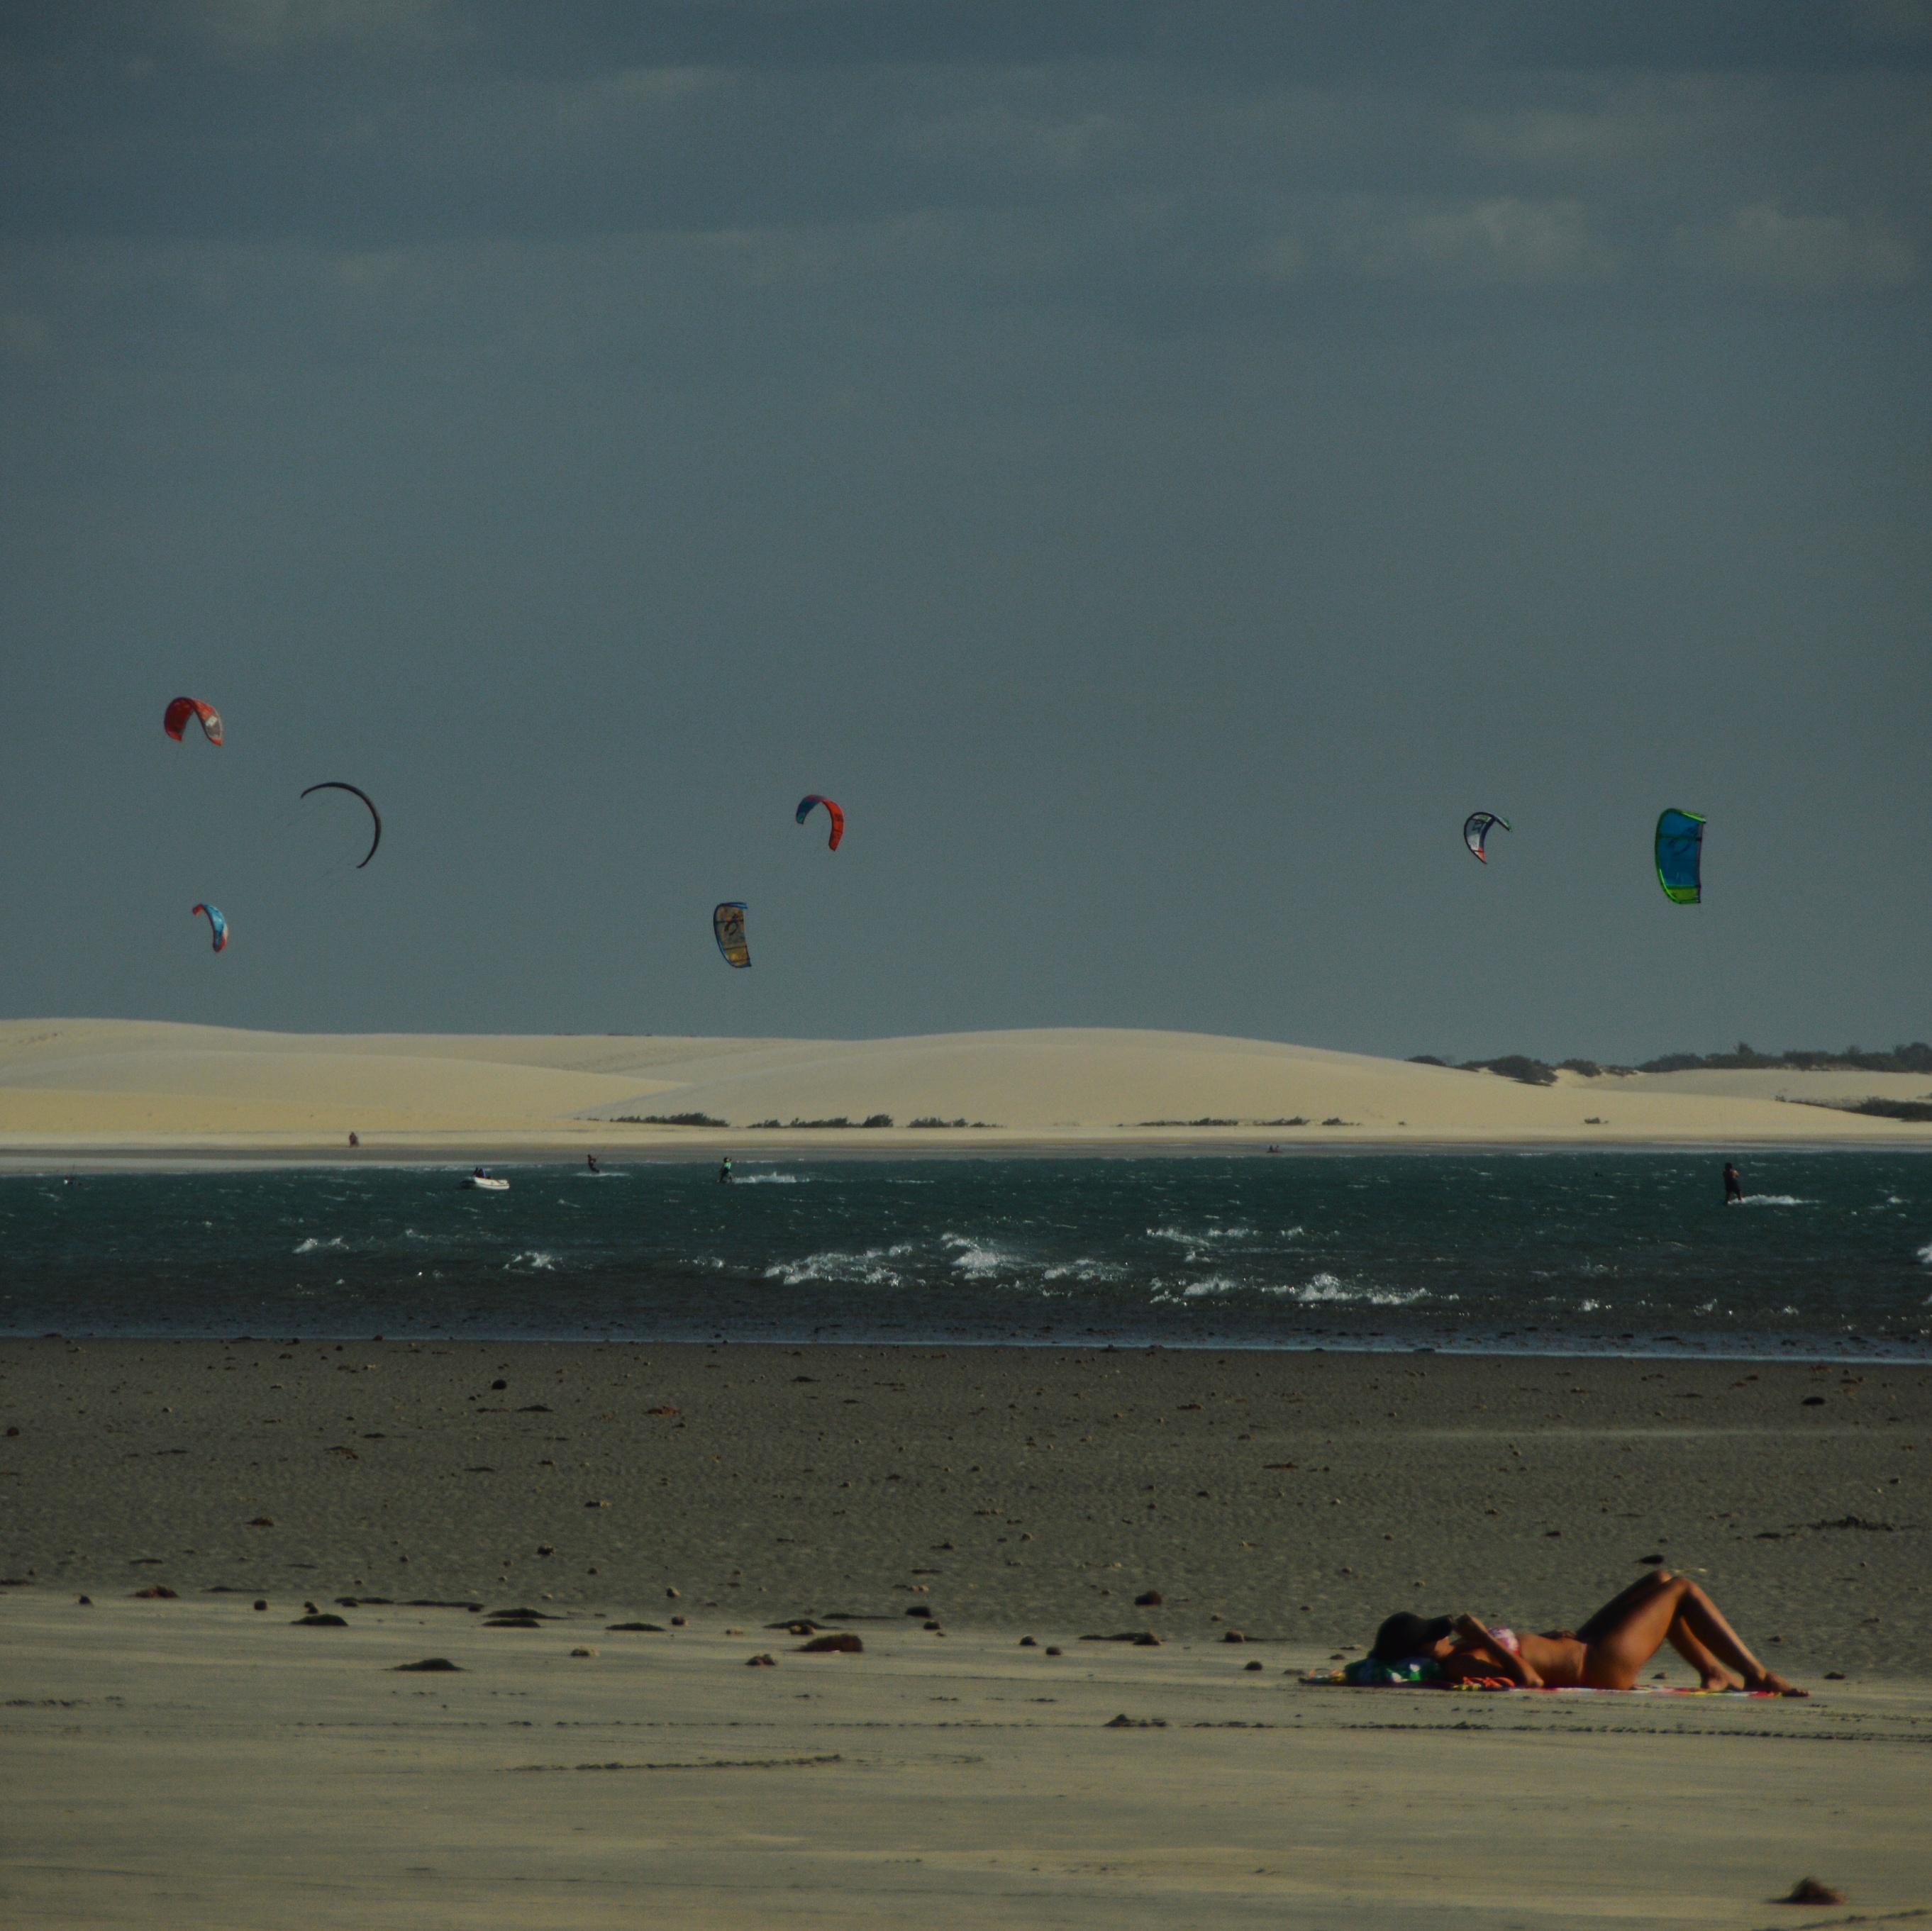 Praia, vento, duna e sol, Jericoacoara - CE, by Luciana de Paula, 2016